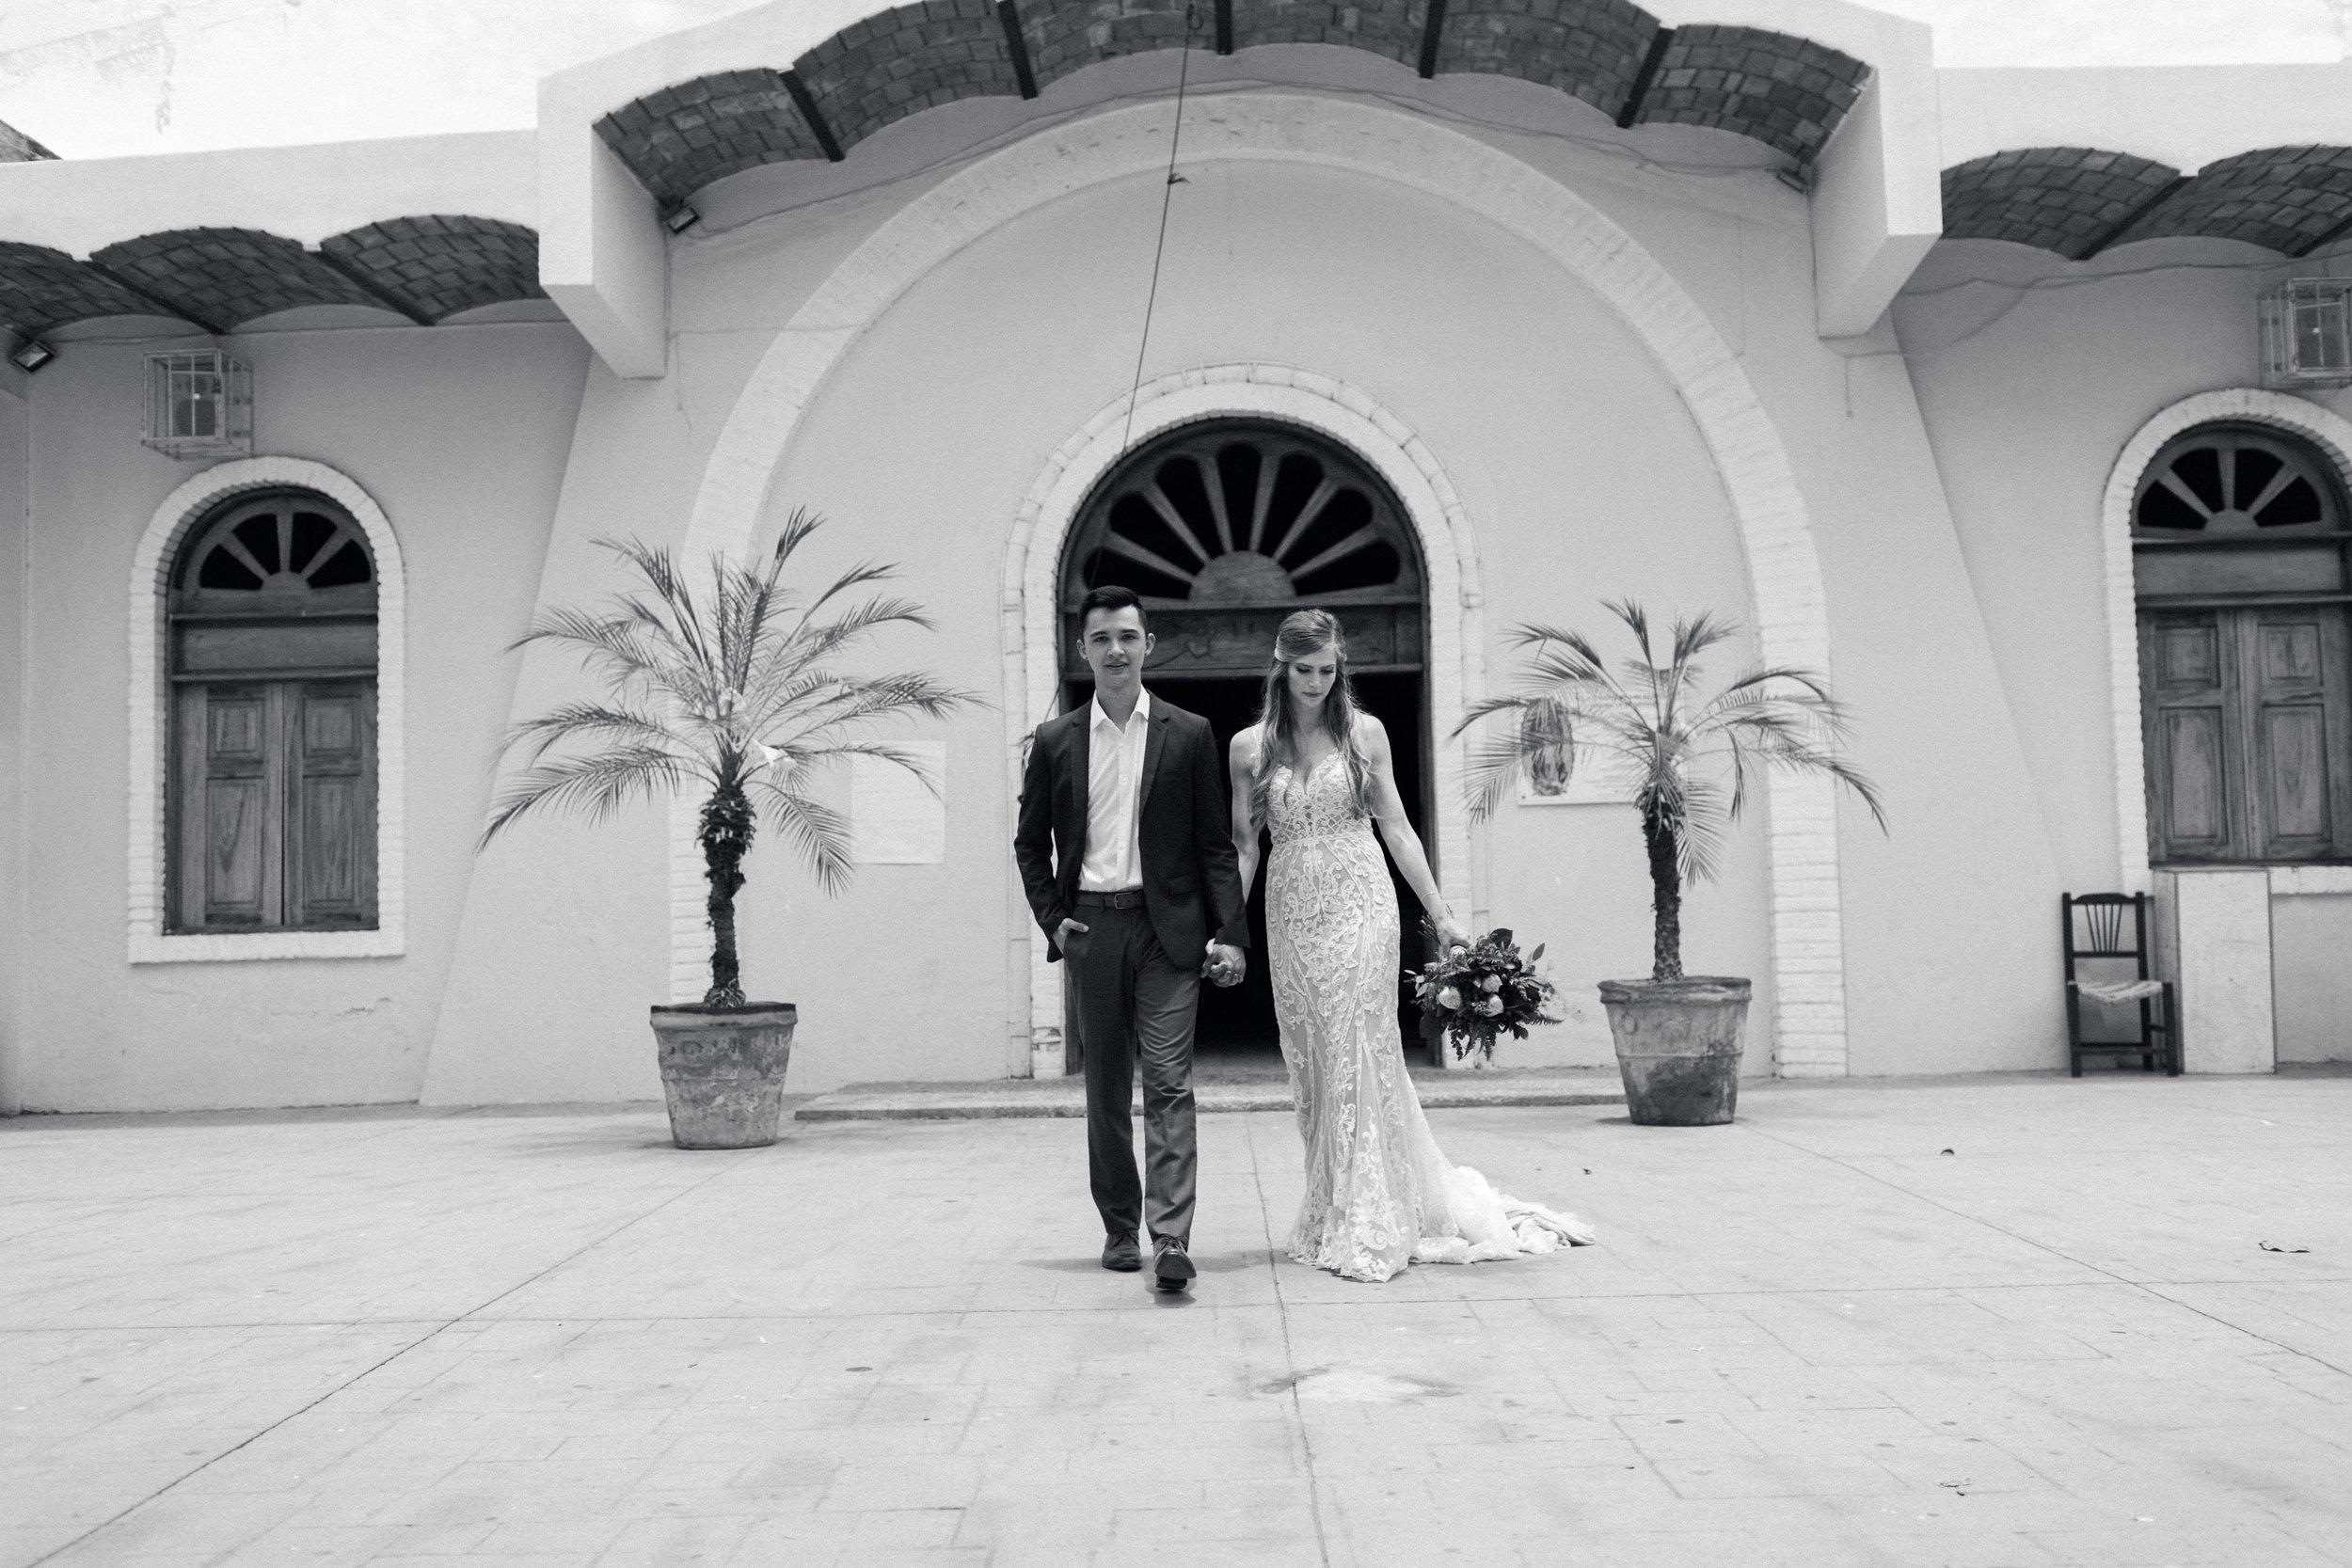 Ryan-Hannah-Sayulita-Mexico-Wedding-Alycia-Lovell-Photography-196.JPG